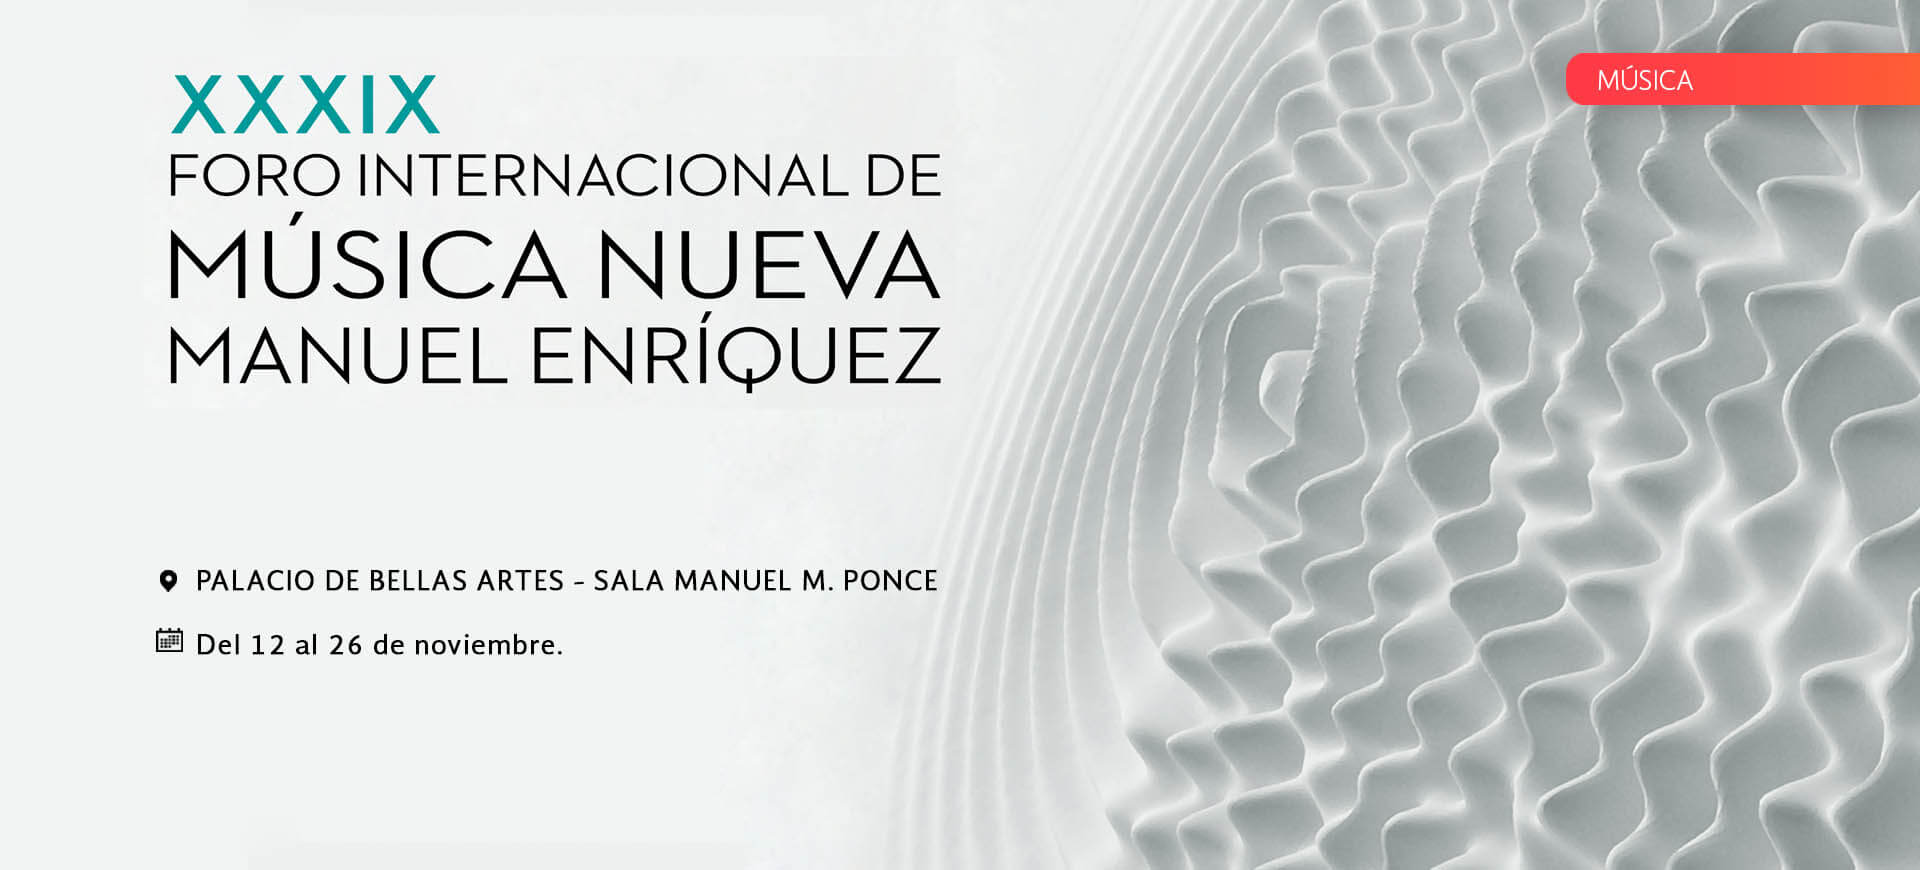 XXXIX Foro Internacional de Música Nueva Manuel Enríquez